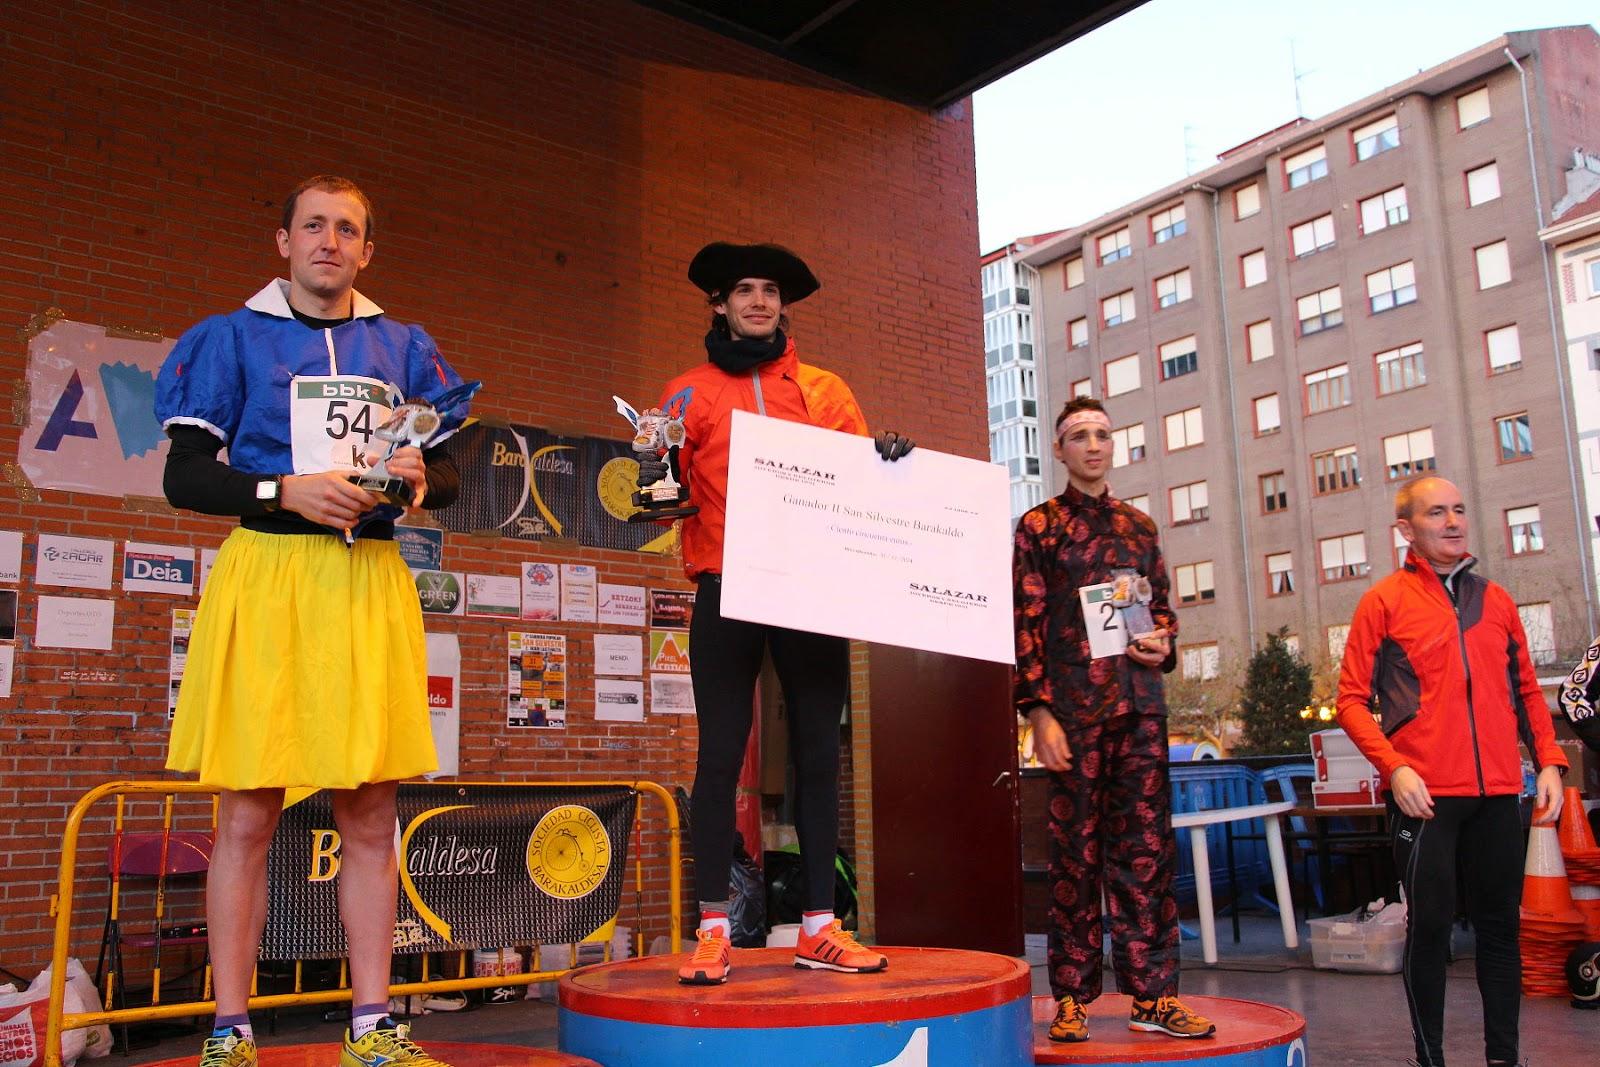 La barakaldesa Belit Solar y el santurtziarra Iker Velasco ganan la segunda carrera San Silvestre